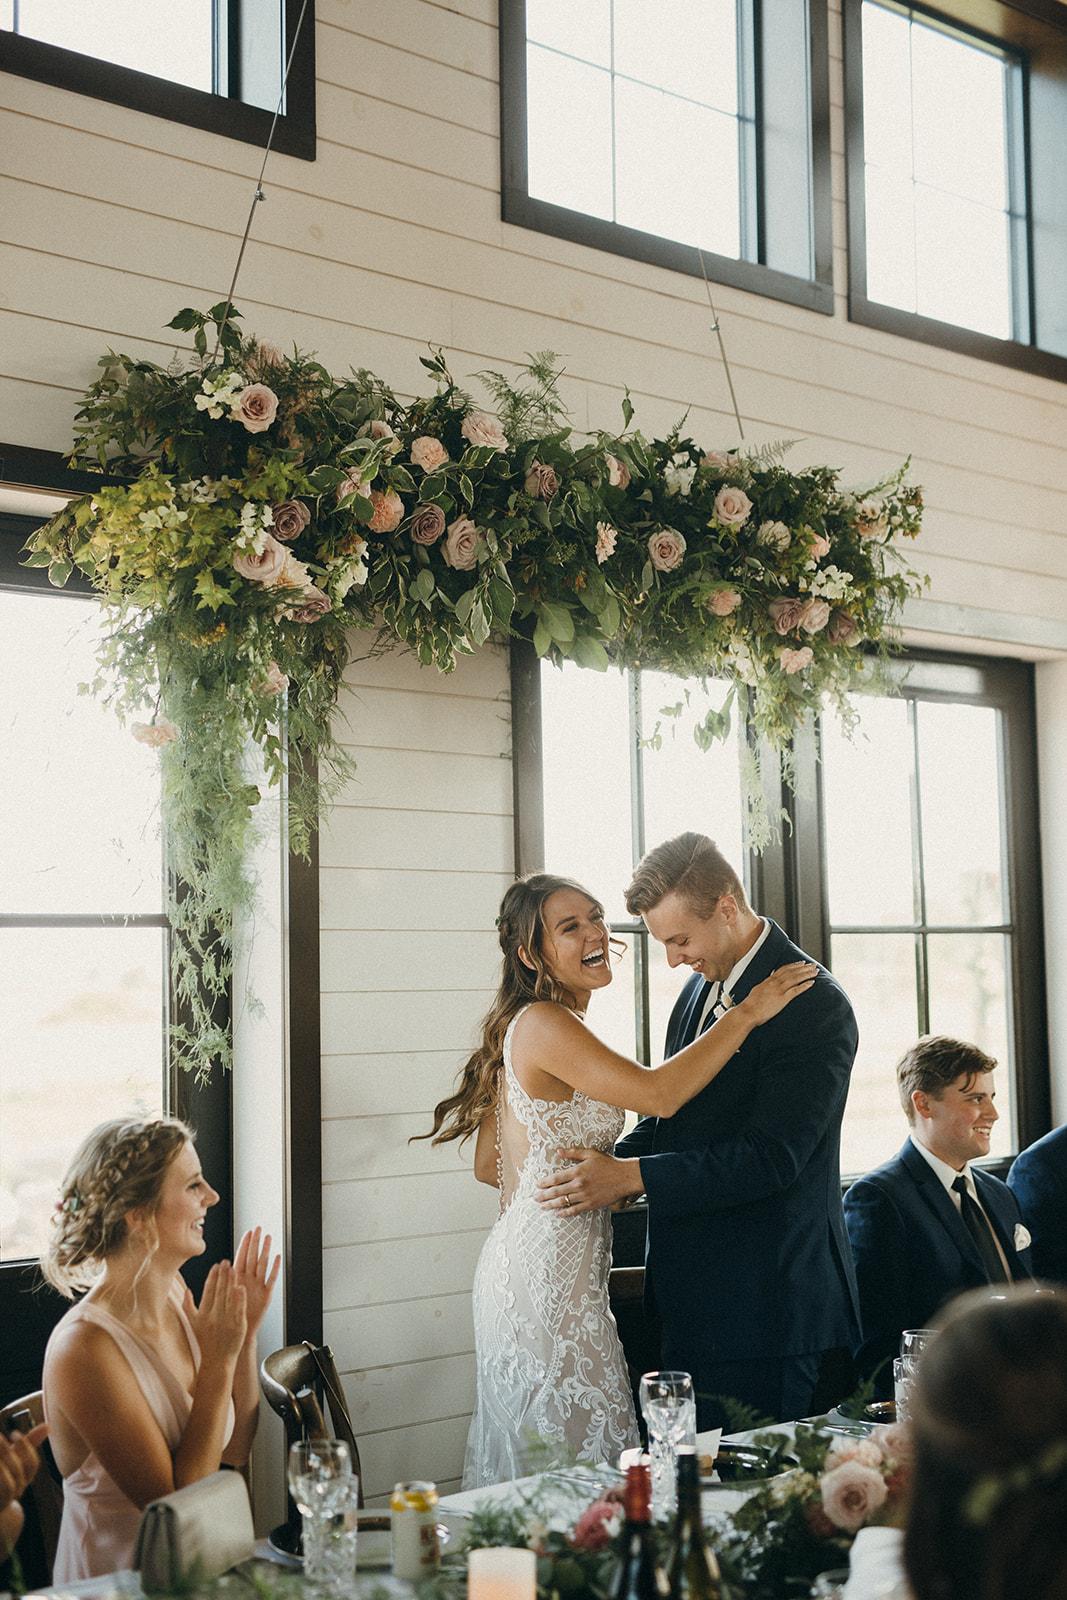 kaden_justine_wedding_3074.jpg